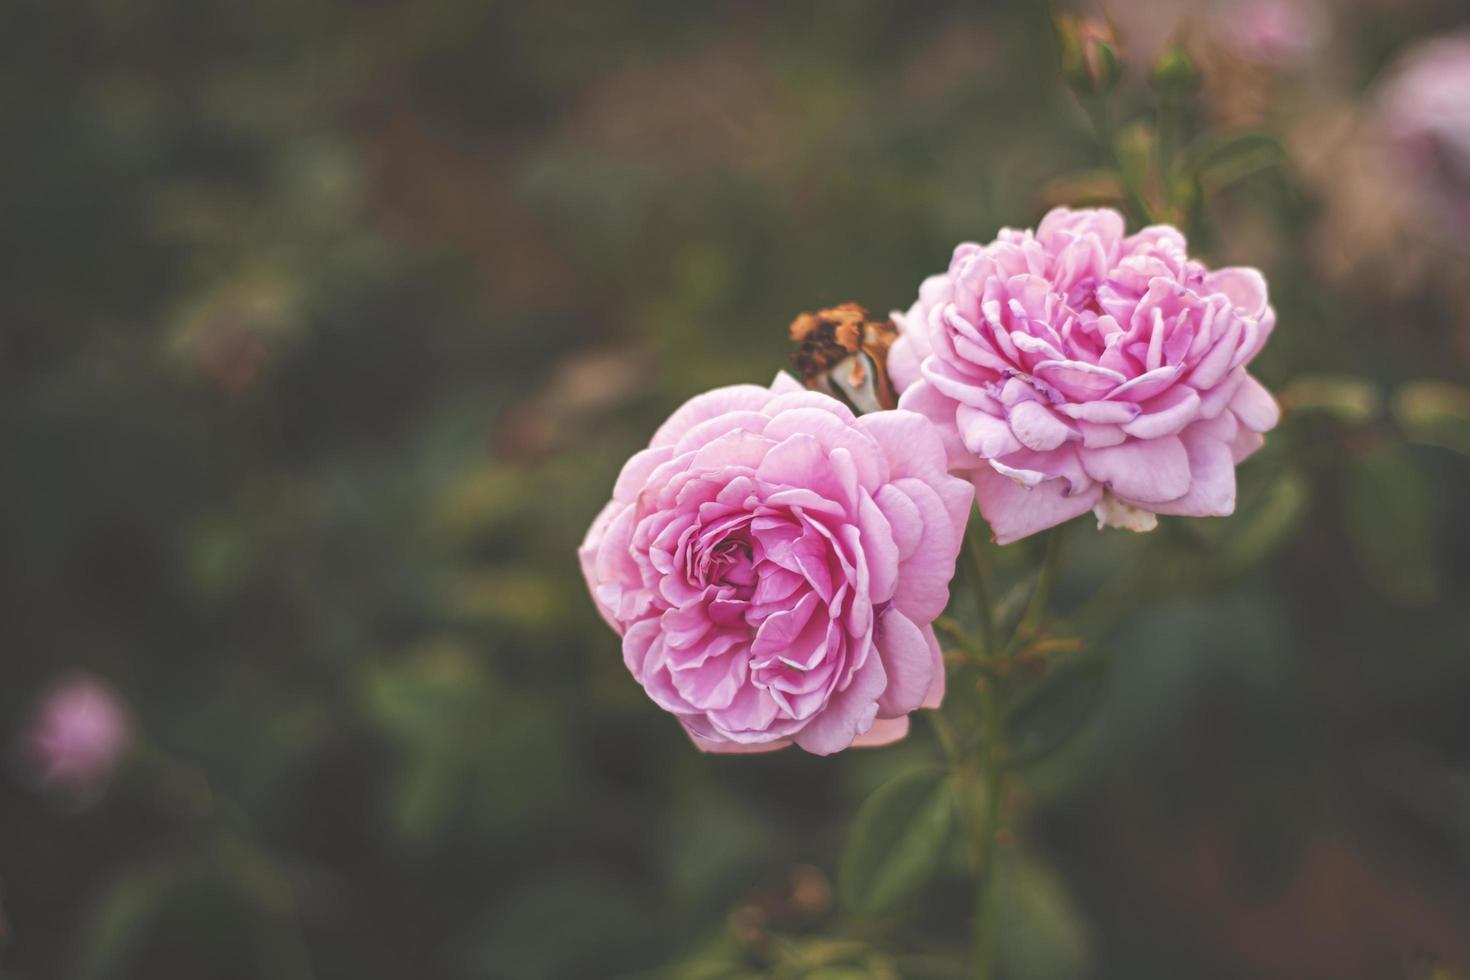 roze roos in de tuin, helder zonsondergang licht, florale achtergrond foto